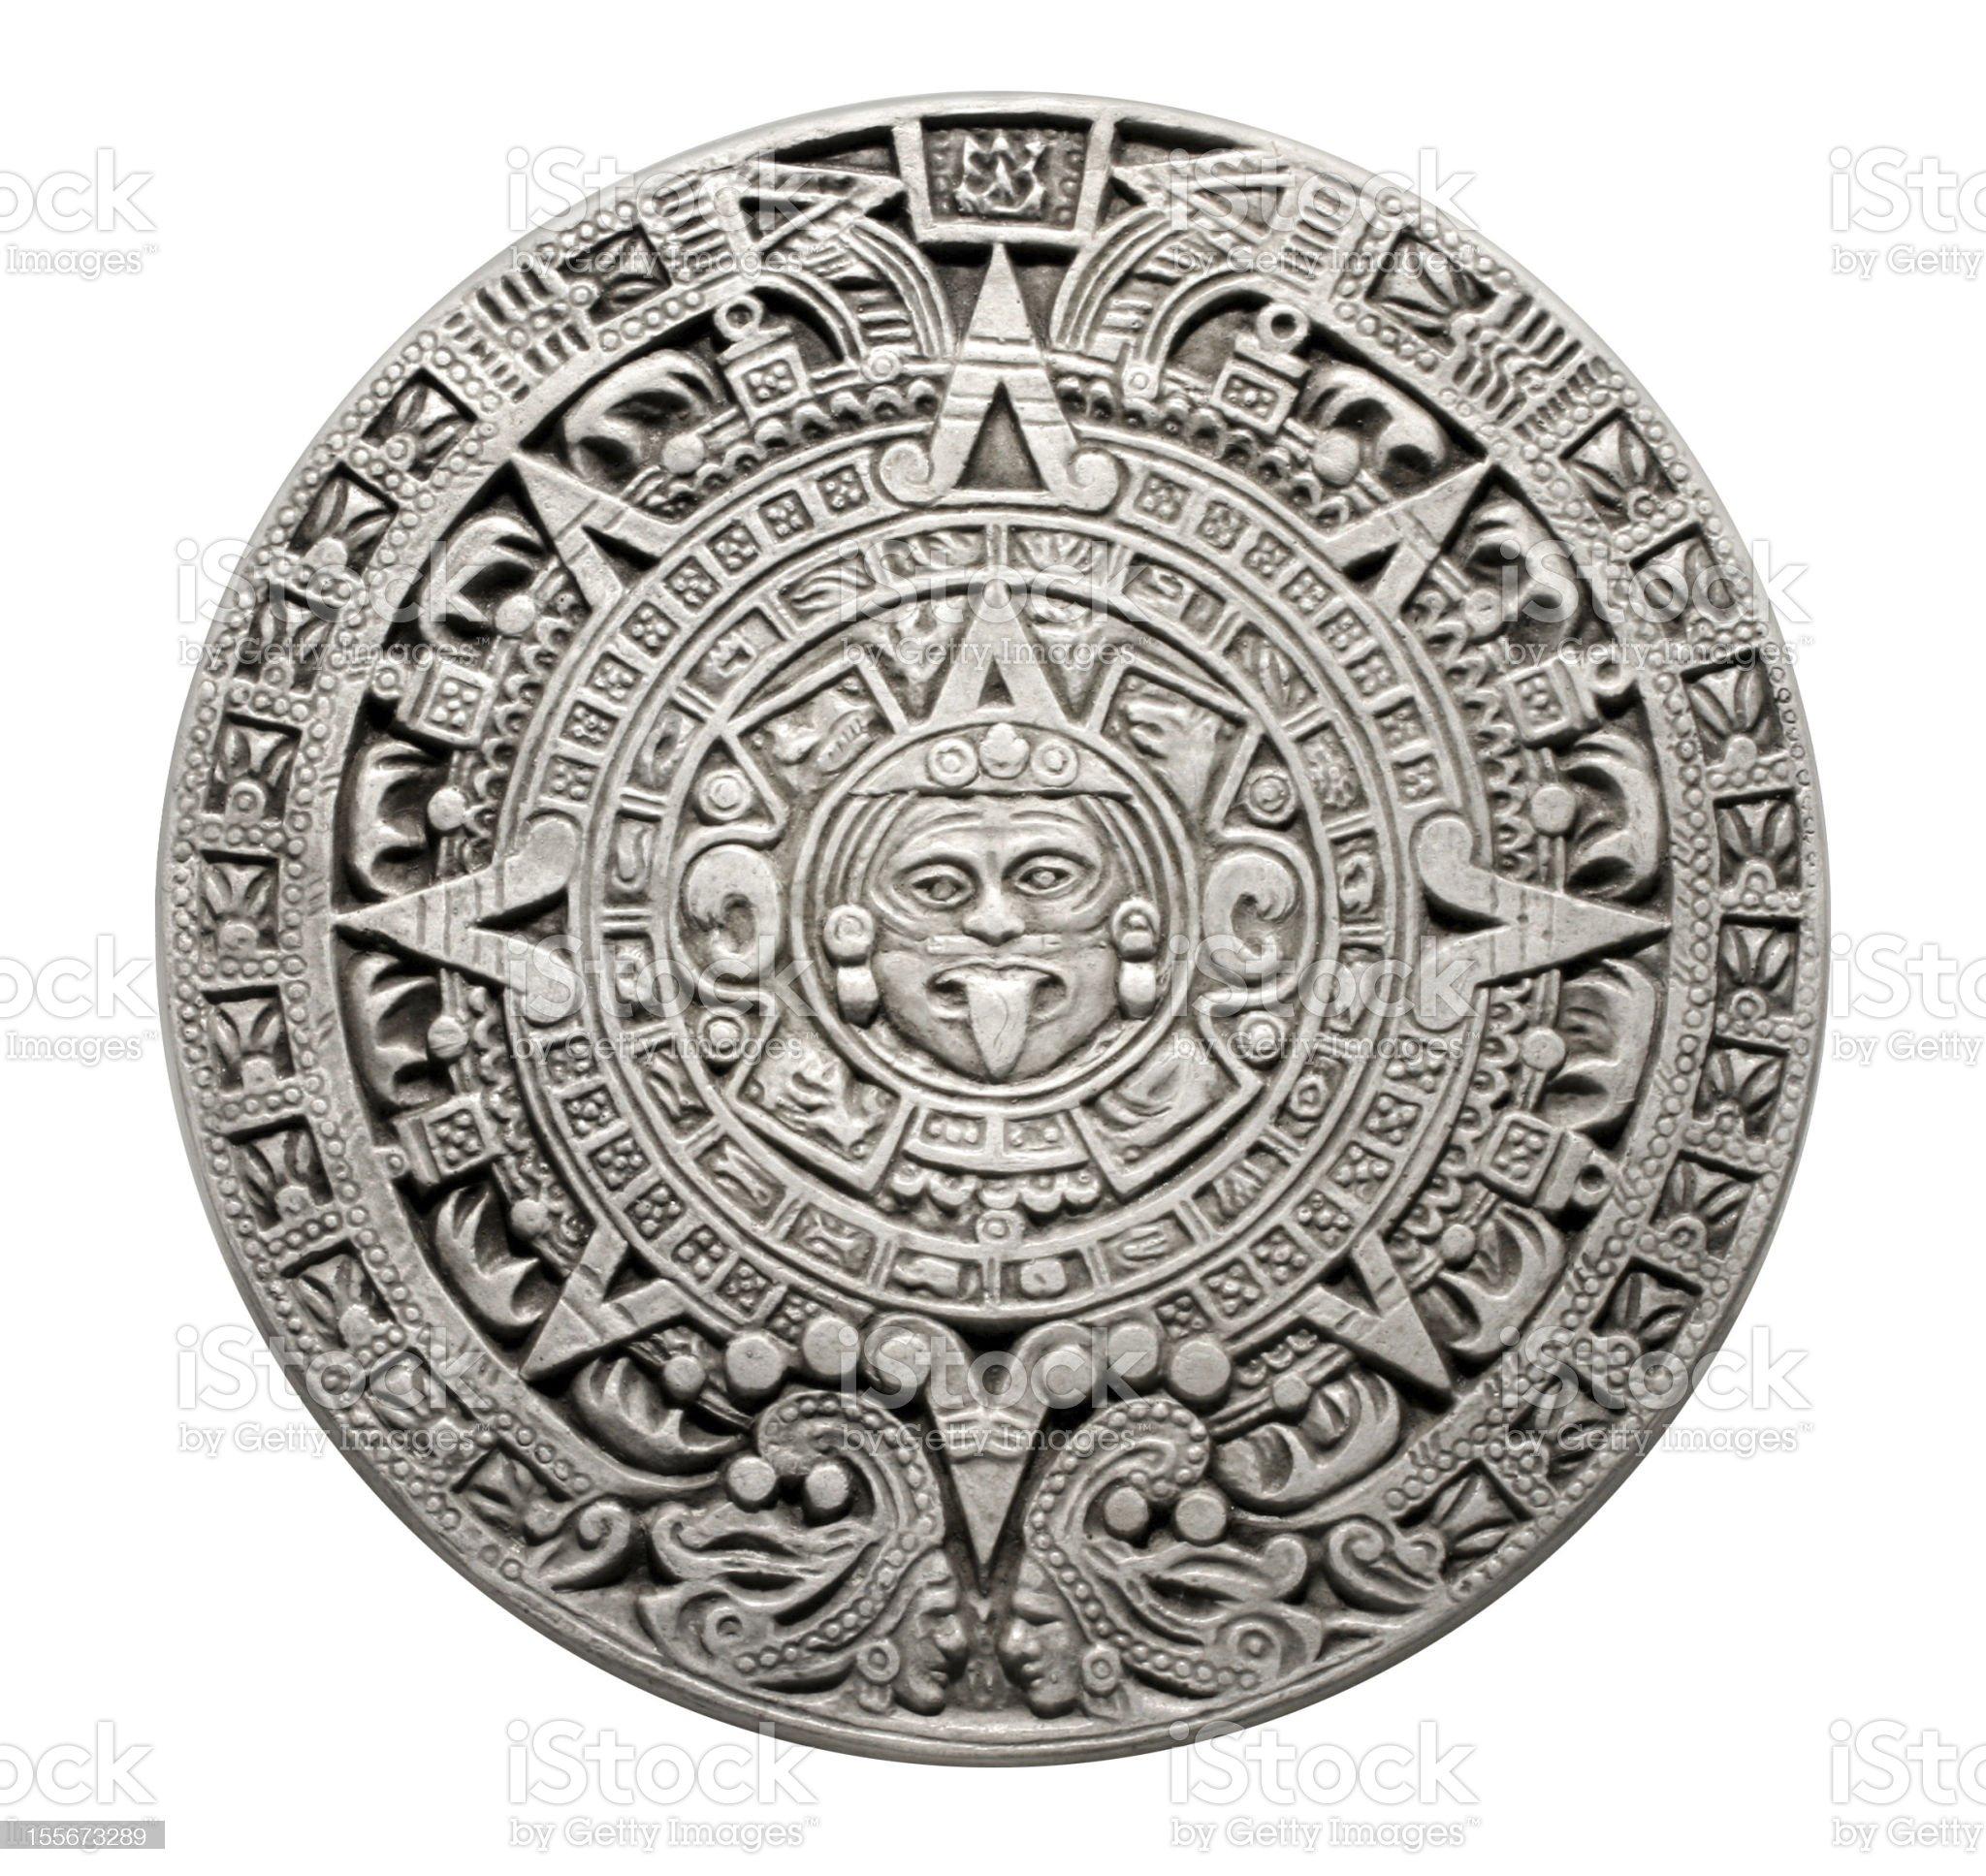 Mayan calendar. royalty-free stock photo